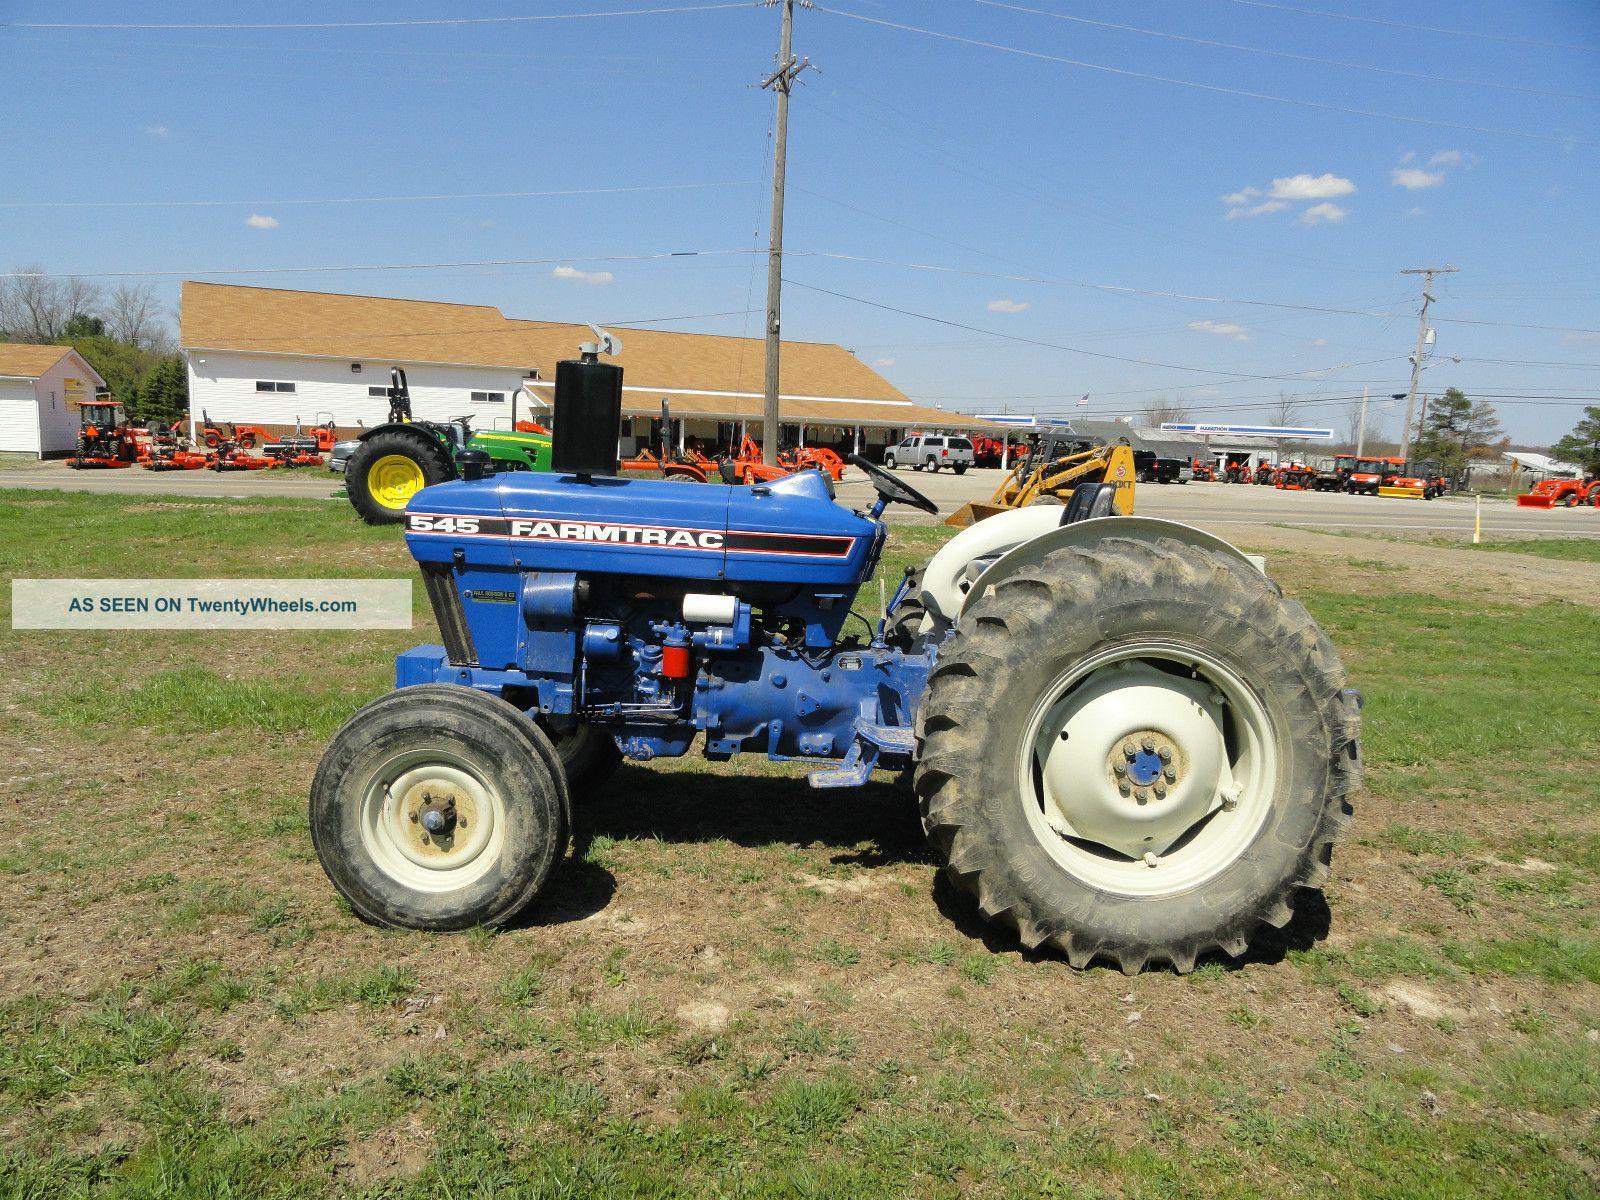 Farm Trac 545,  Farm Trac 545 Tractor,  Tractor Tractors photo